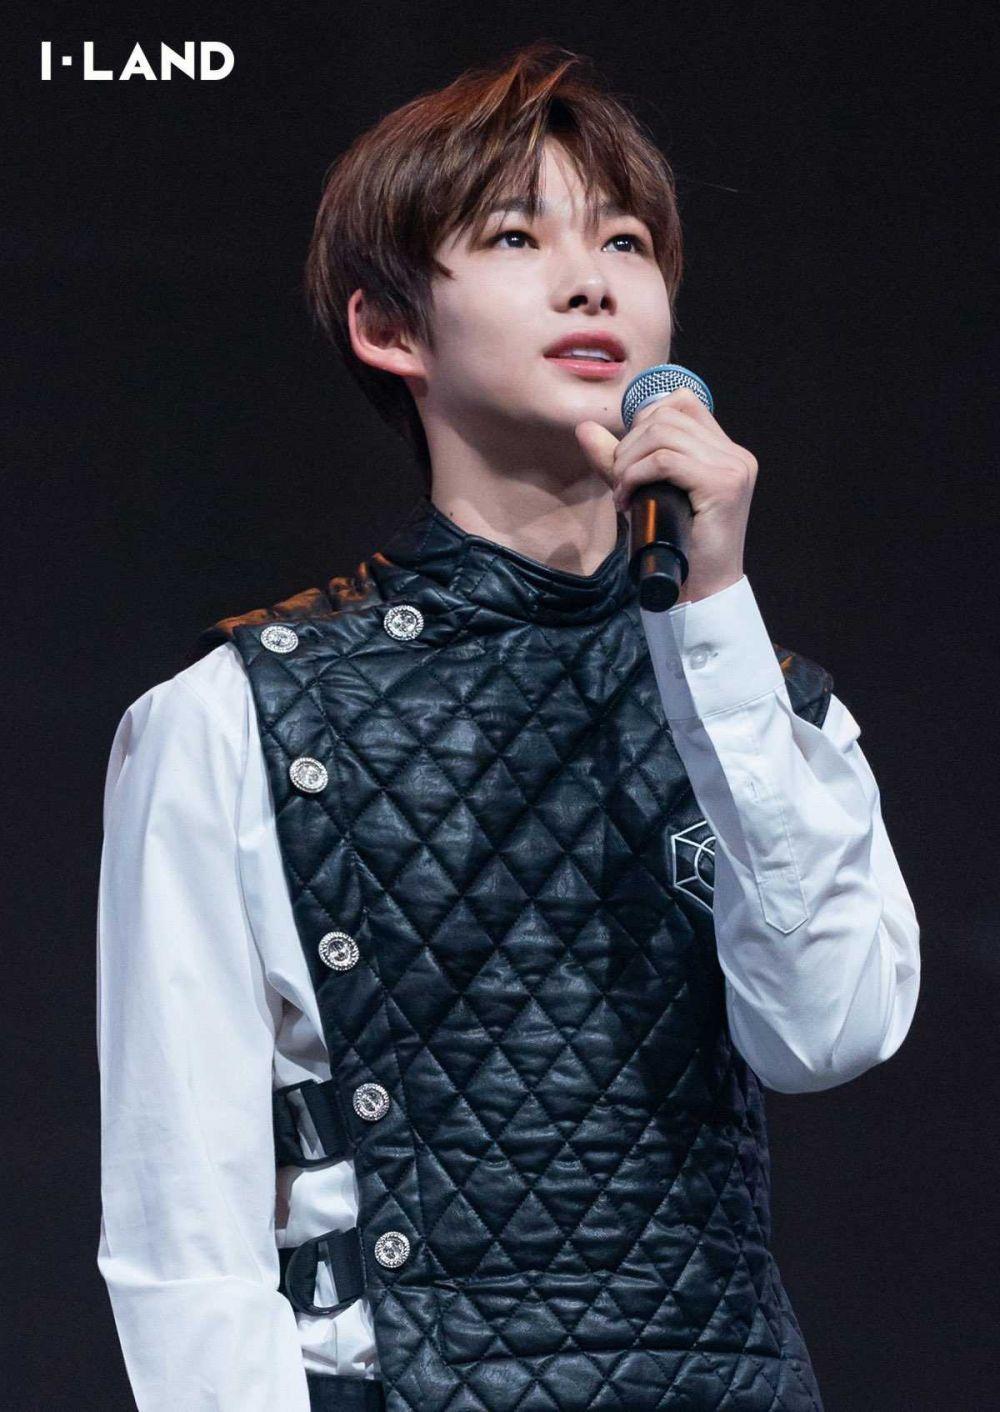 Kenalan Yuk Sama 7 Member ENHYPEN, Boy Group Baru yang Segera Debut!